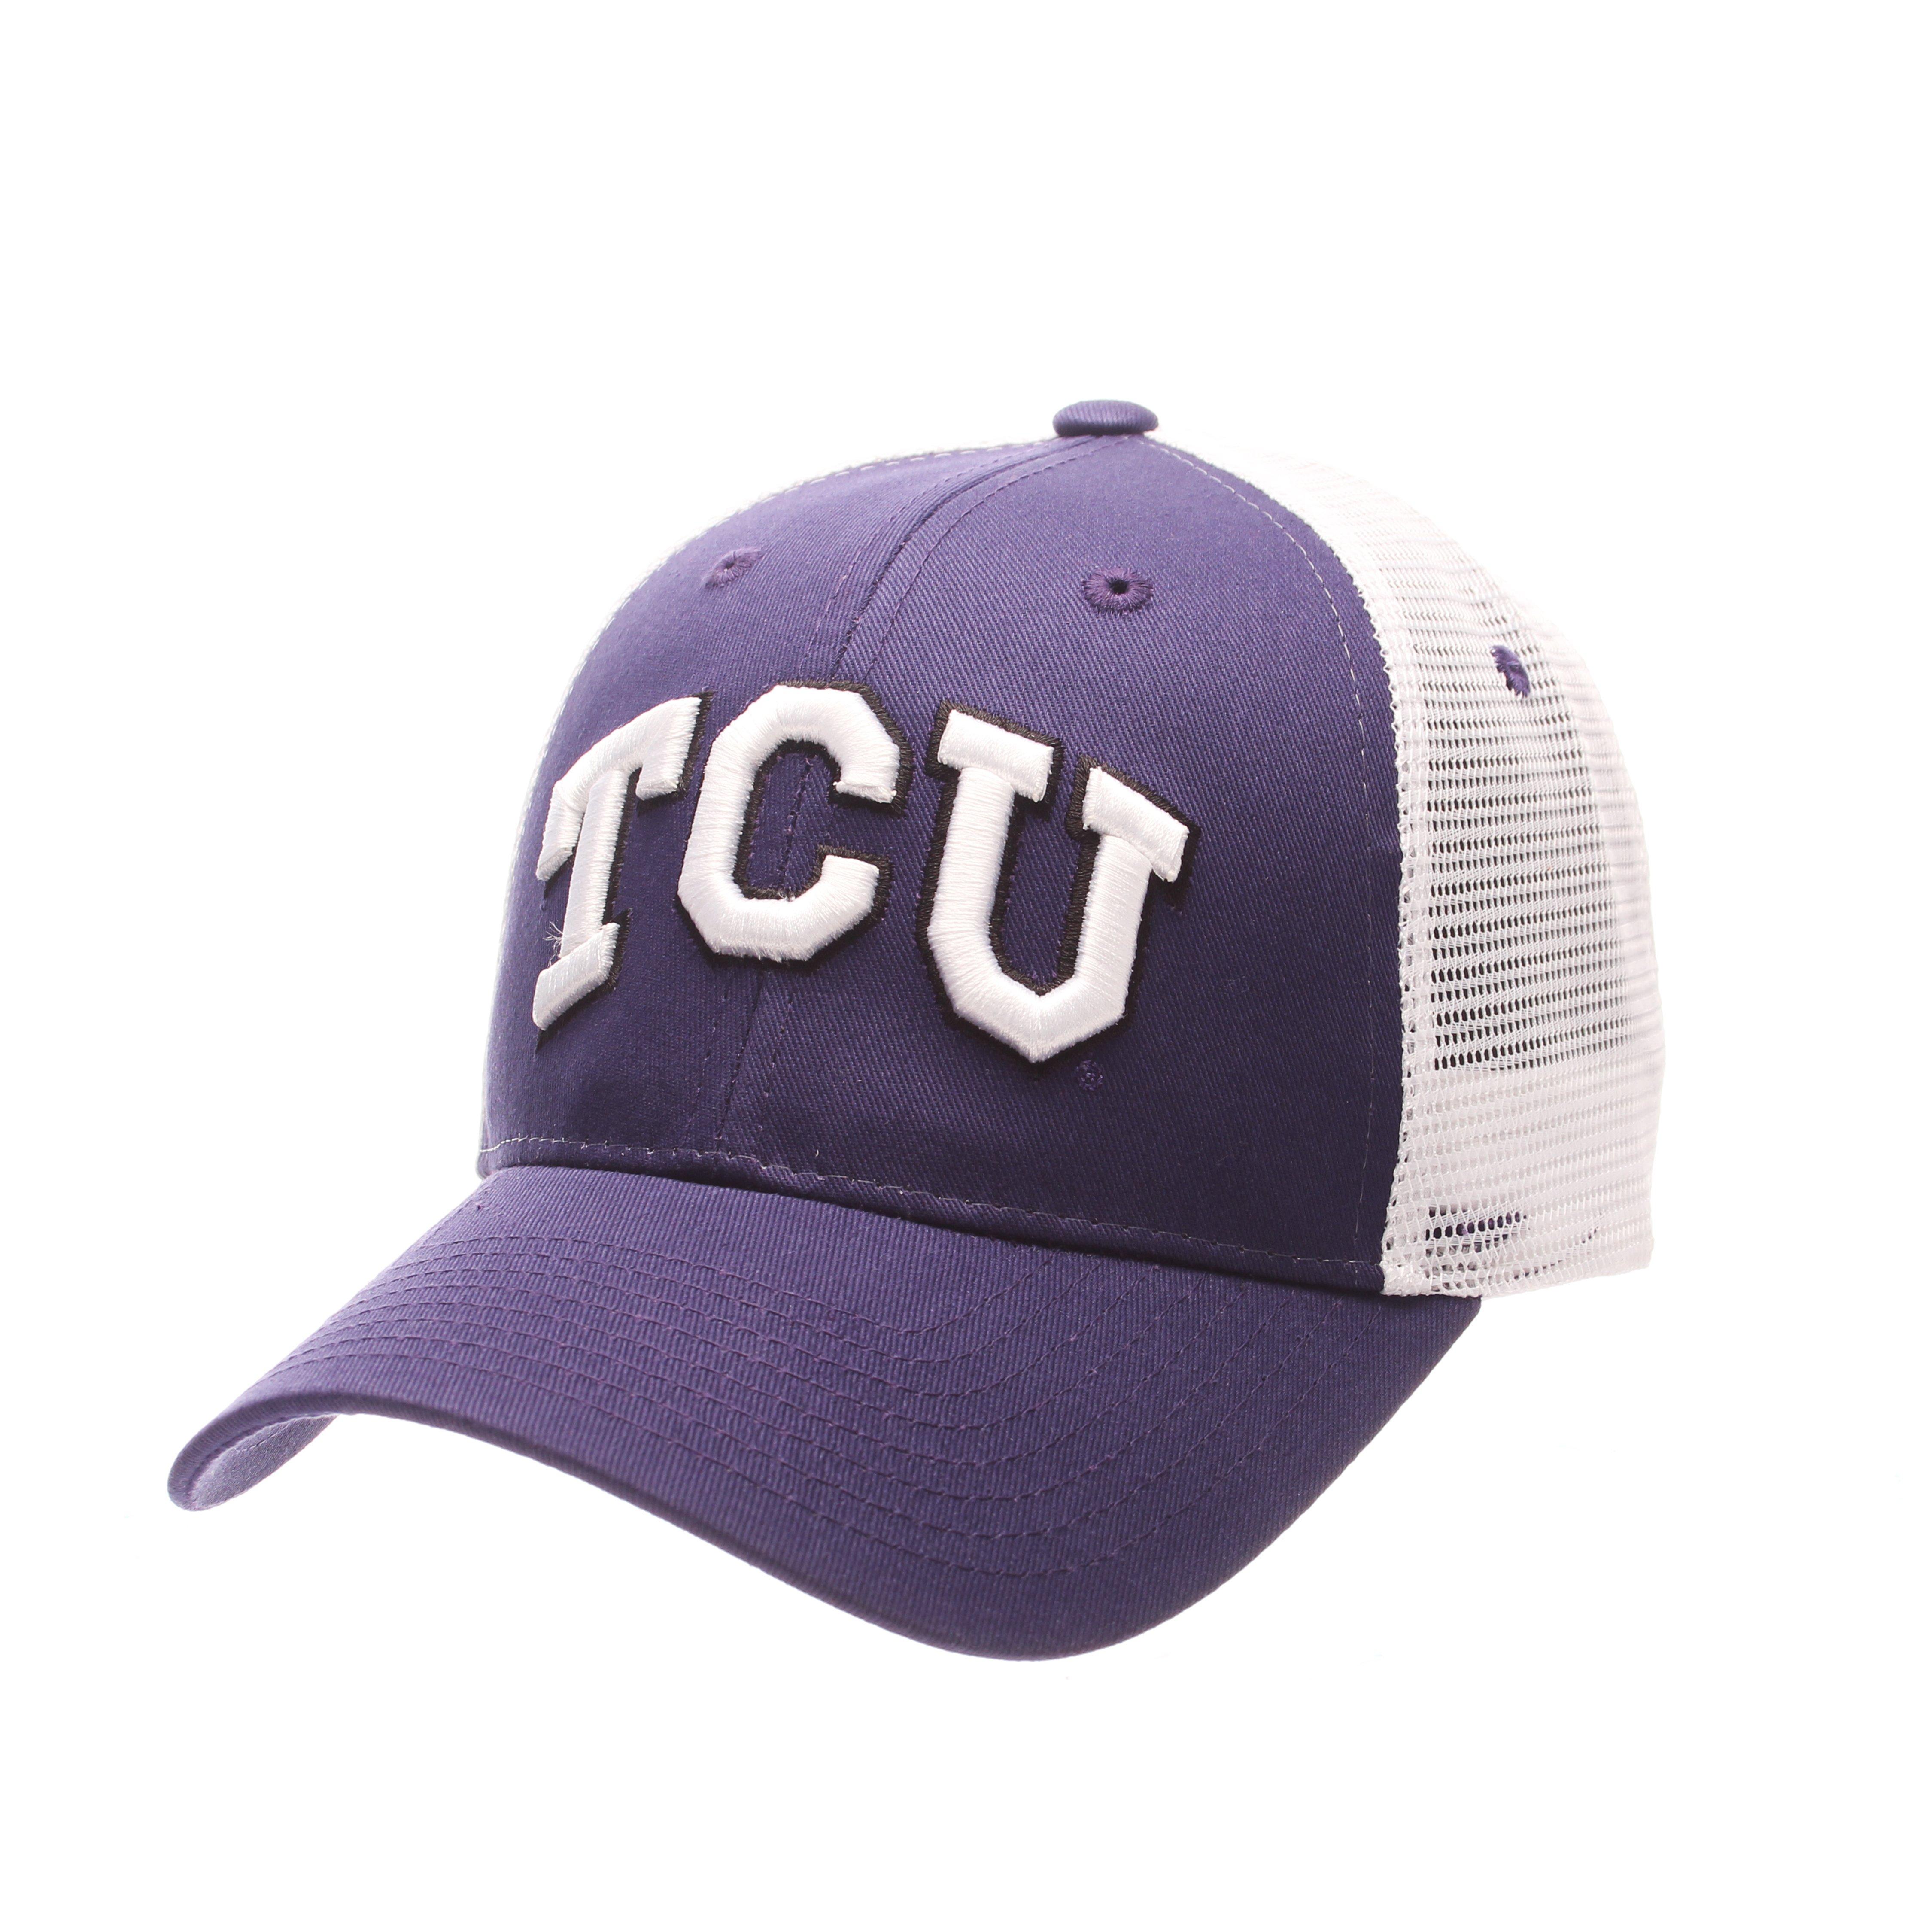 Tcu Horned Frogs Official NCAA Big Rig Adjustable Hat Cap by Zephyr 501764